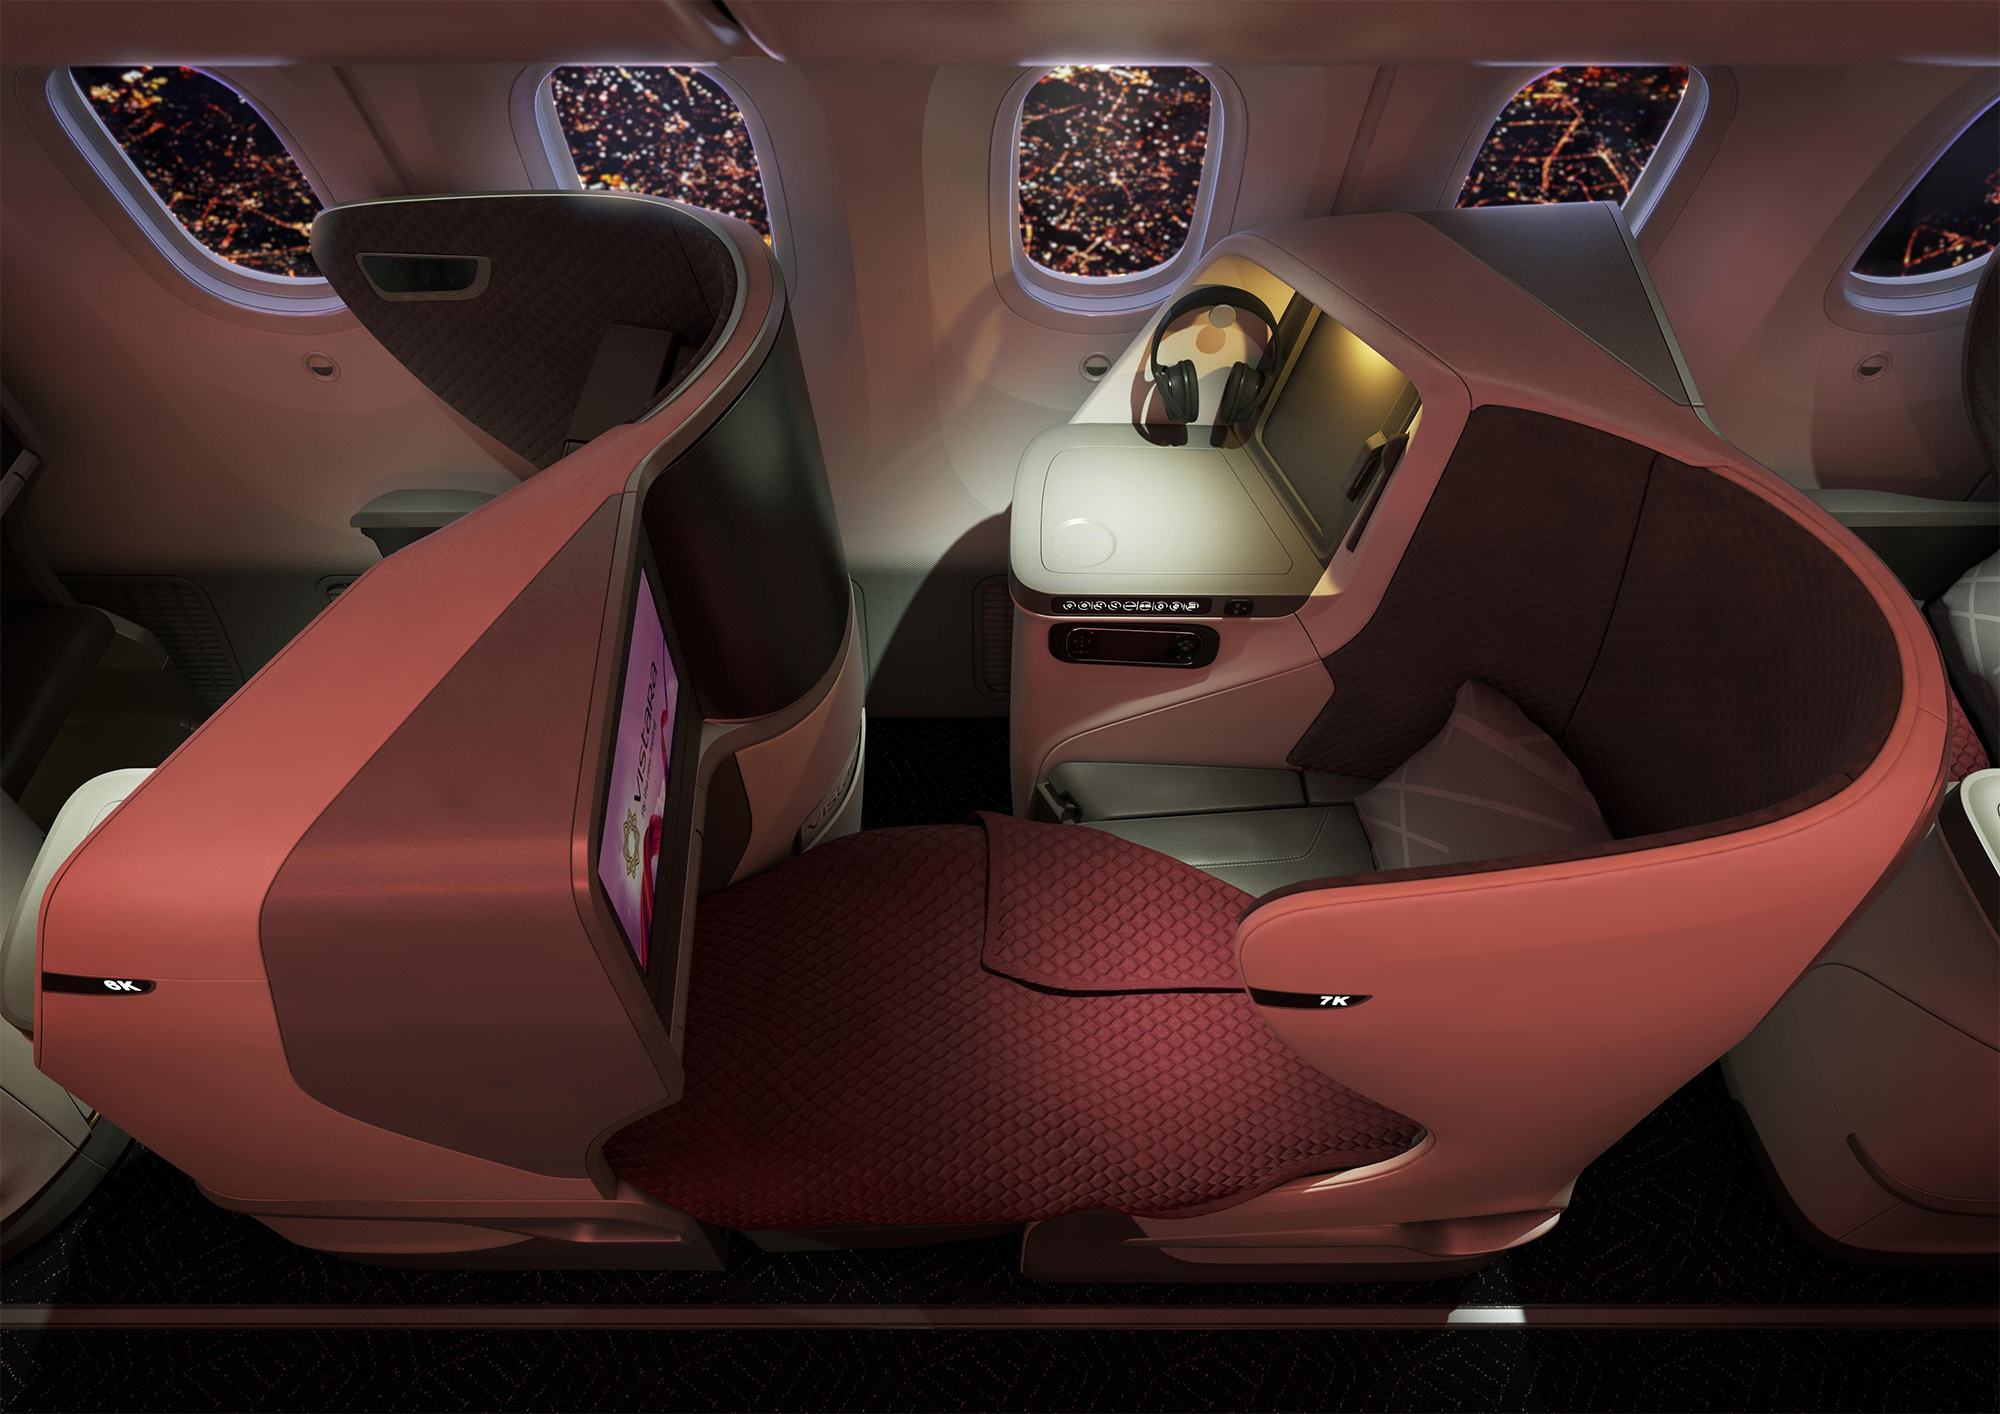 Business Window Seat (Vistara)